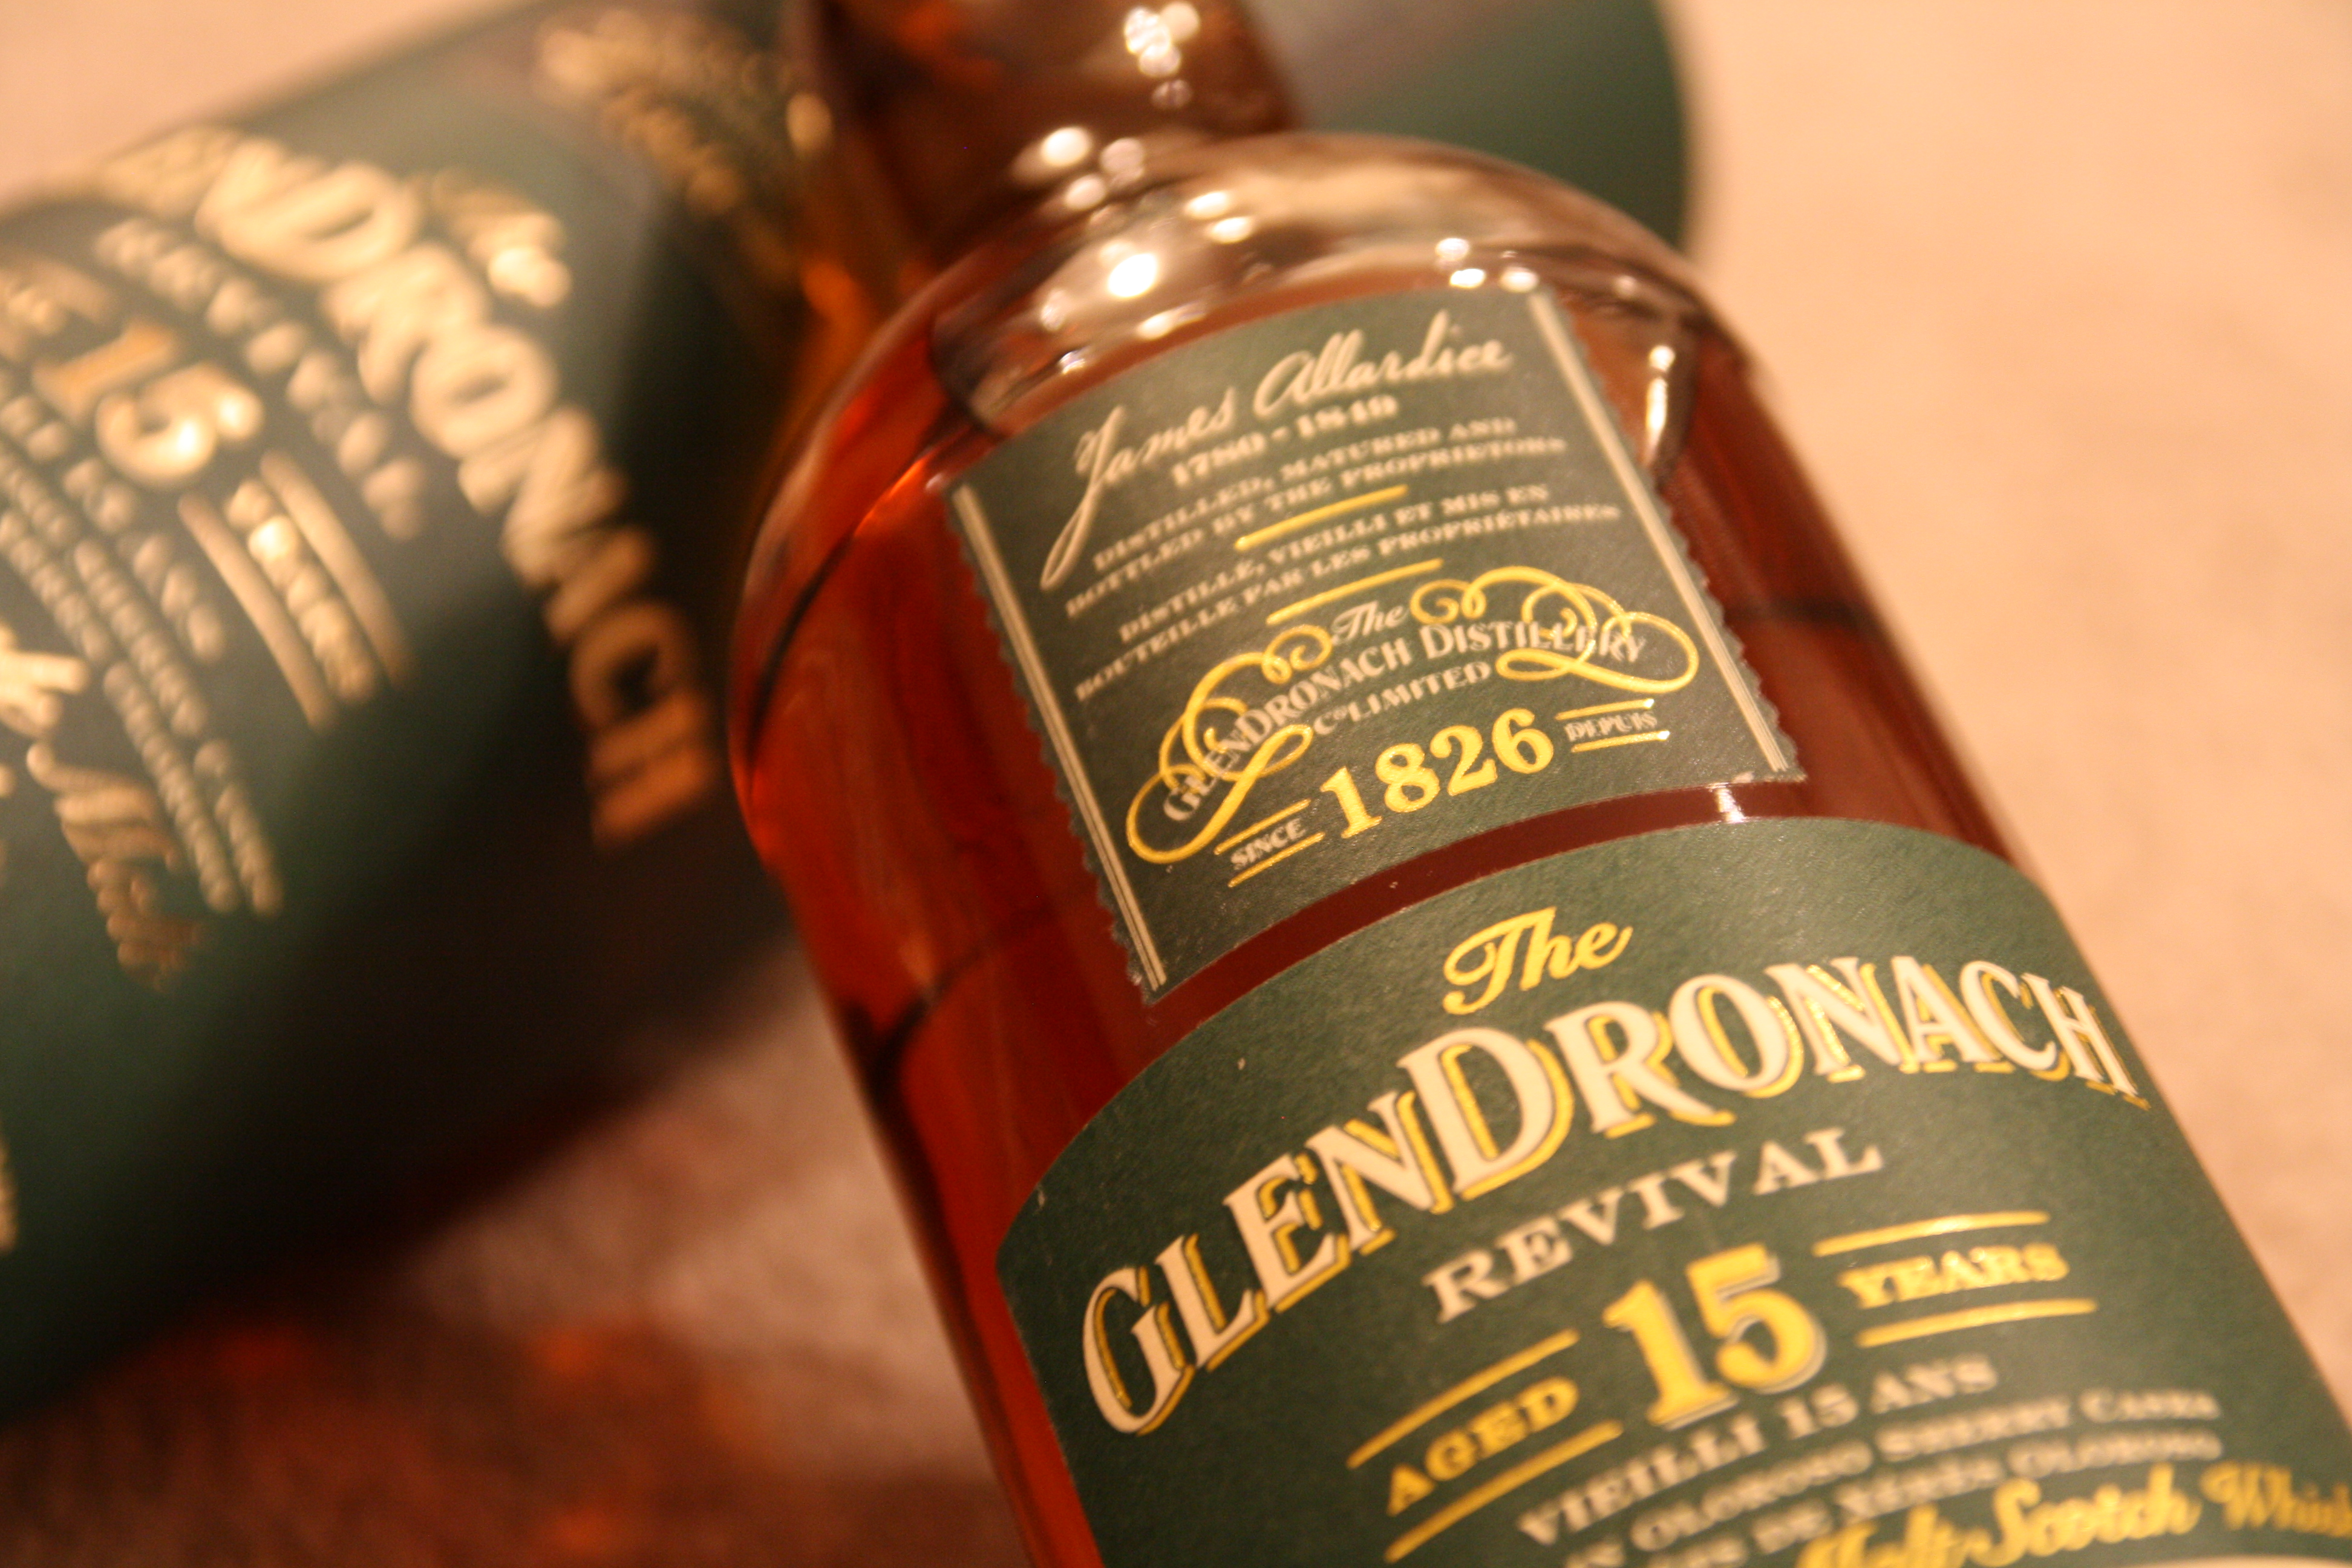 Glendronach 15 Year Revival – single malt scotch